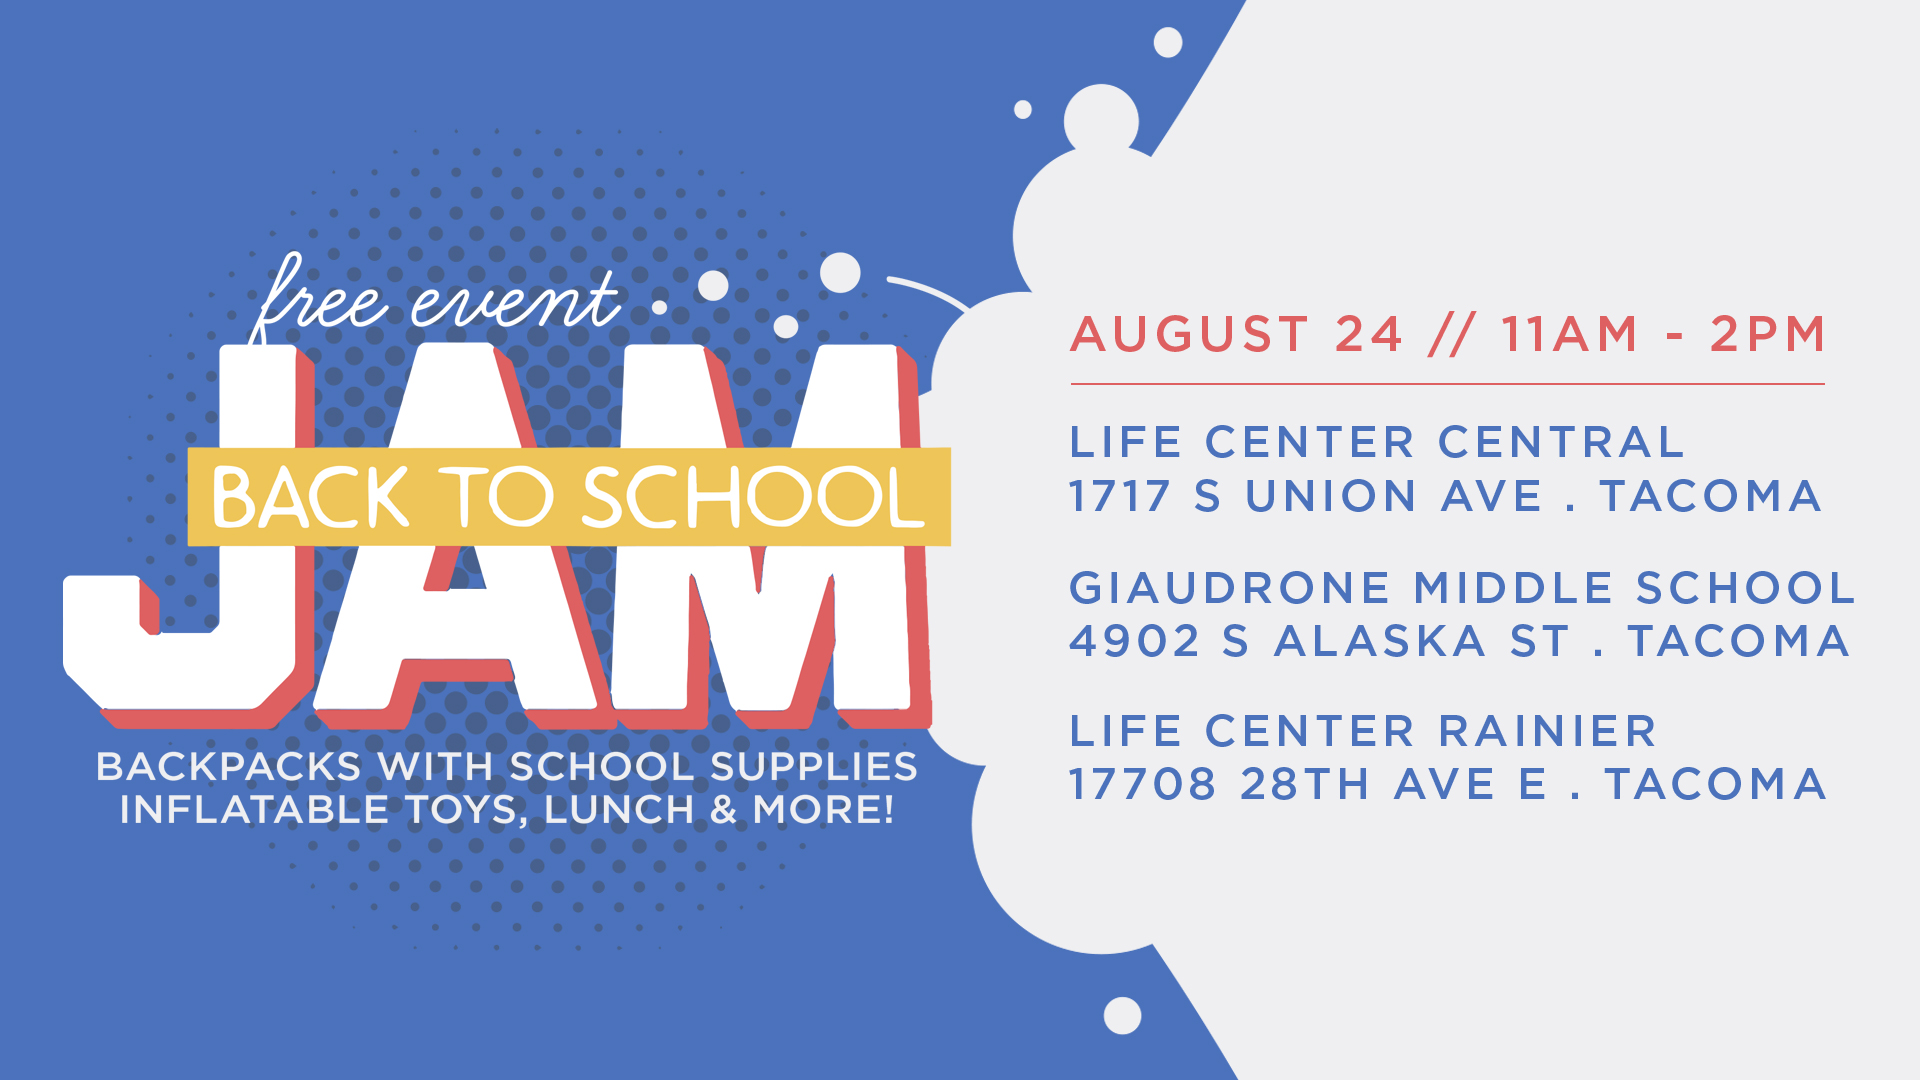 Life Center Central | Back to School Jam